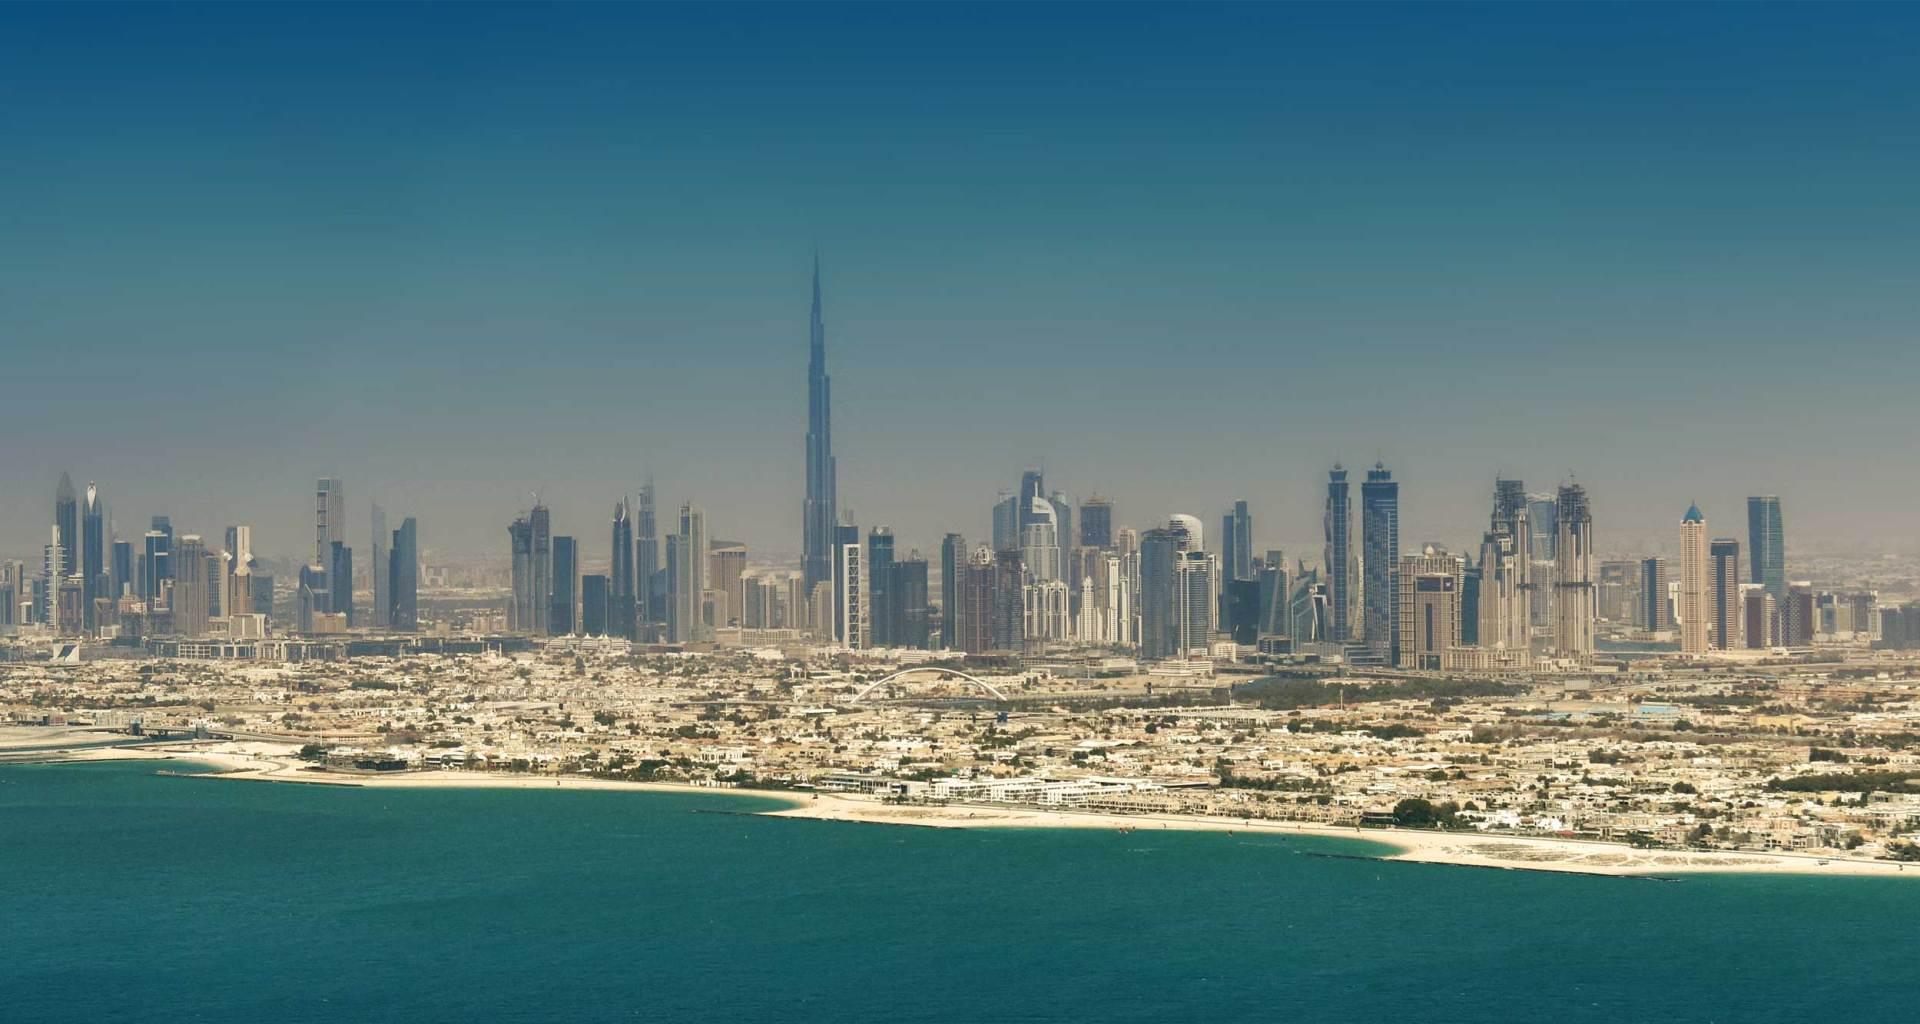 Dubai, United Arab Emirates skyline.